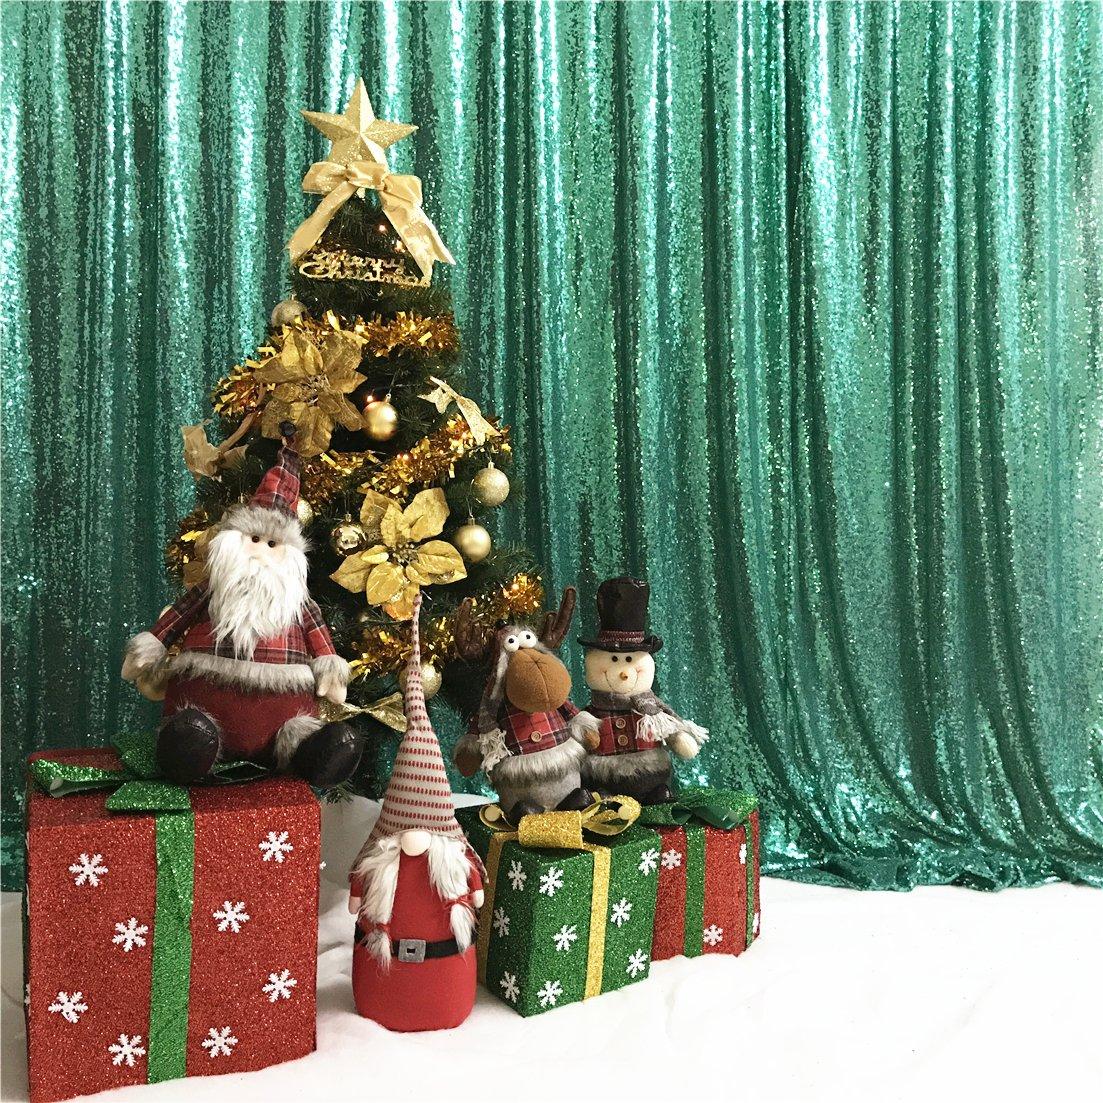 TRLYC 20フィート x 10フィート グリーンスパンコール背景幕、スパンコールフォトブース背景幕 輝く背景幕 ウェディングパーティー クリスマスデコレーション   B07LBK35HY